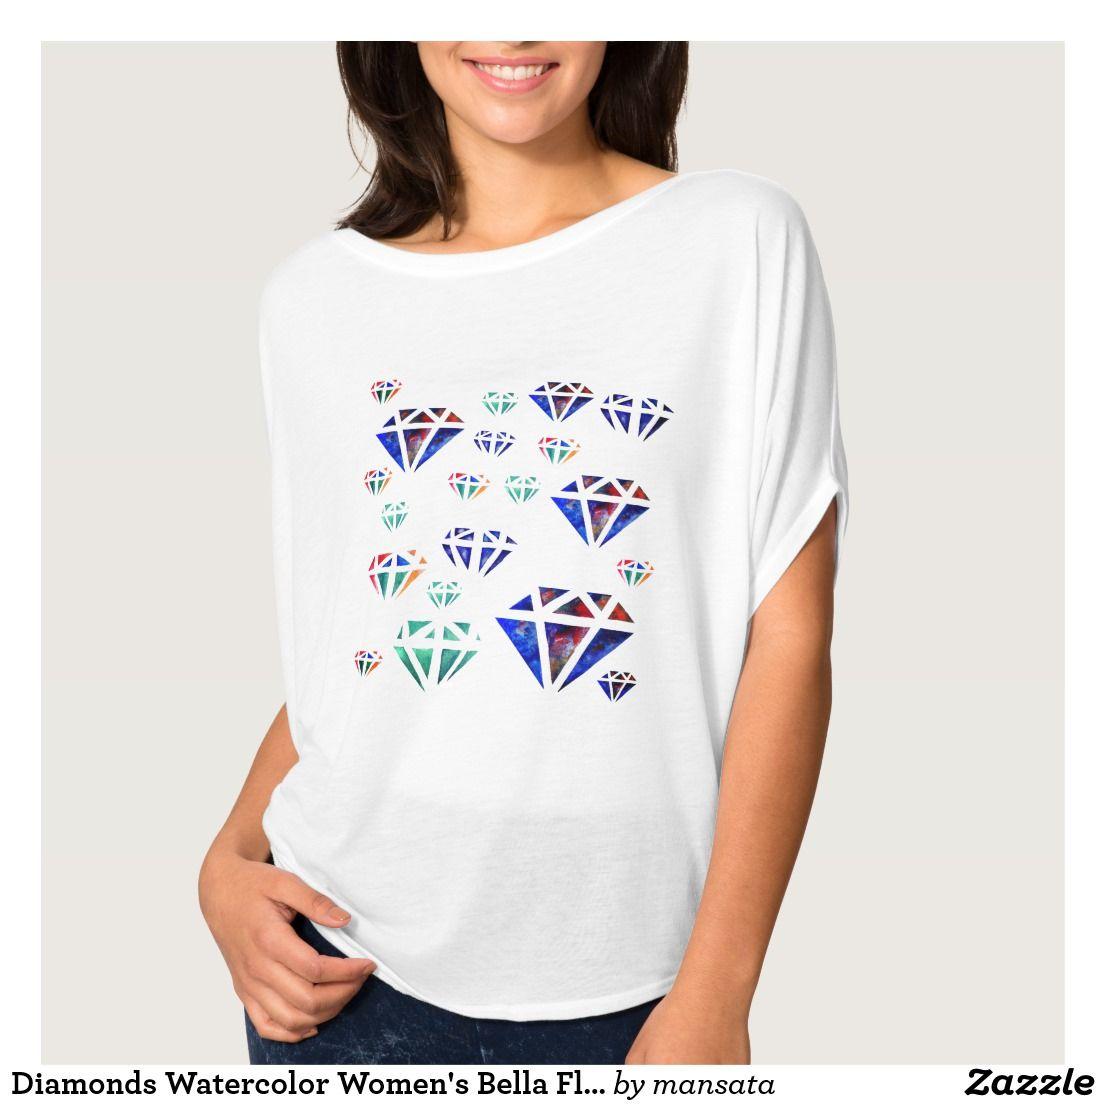 Diamonds Watercolor Women's Bella Flowy Circle Top